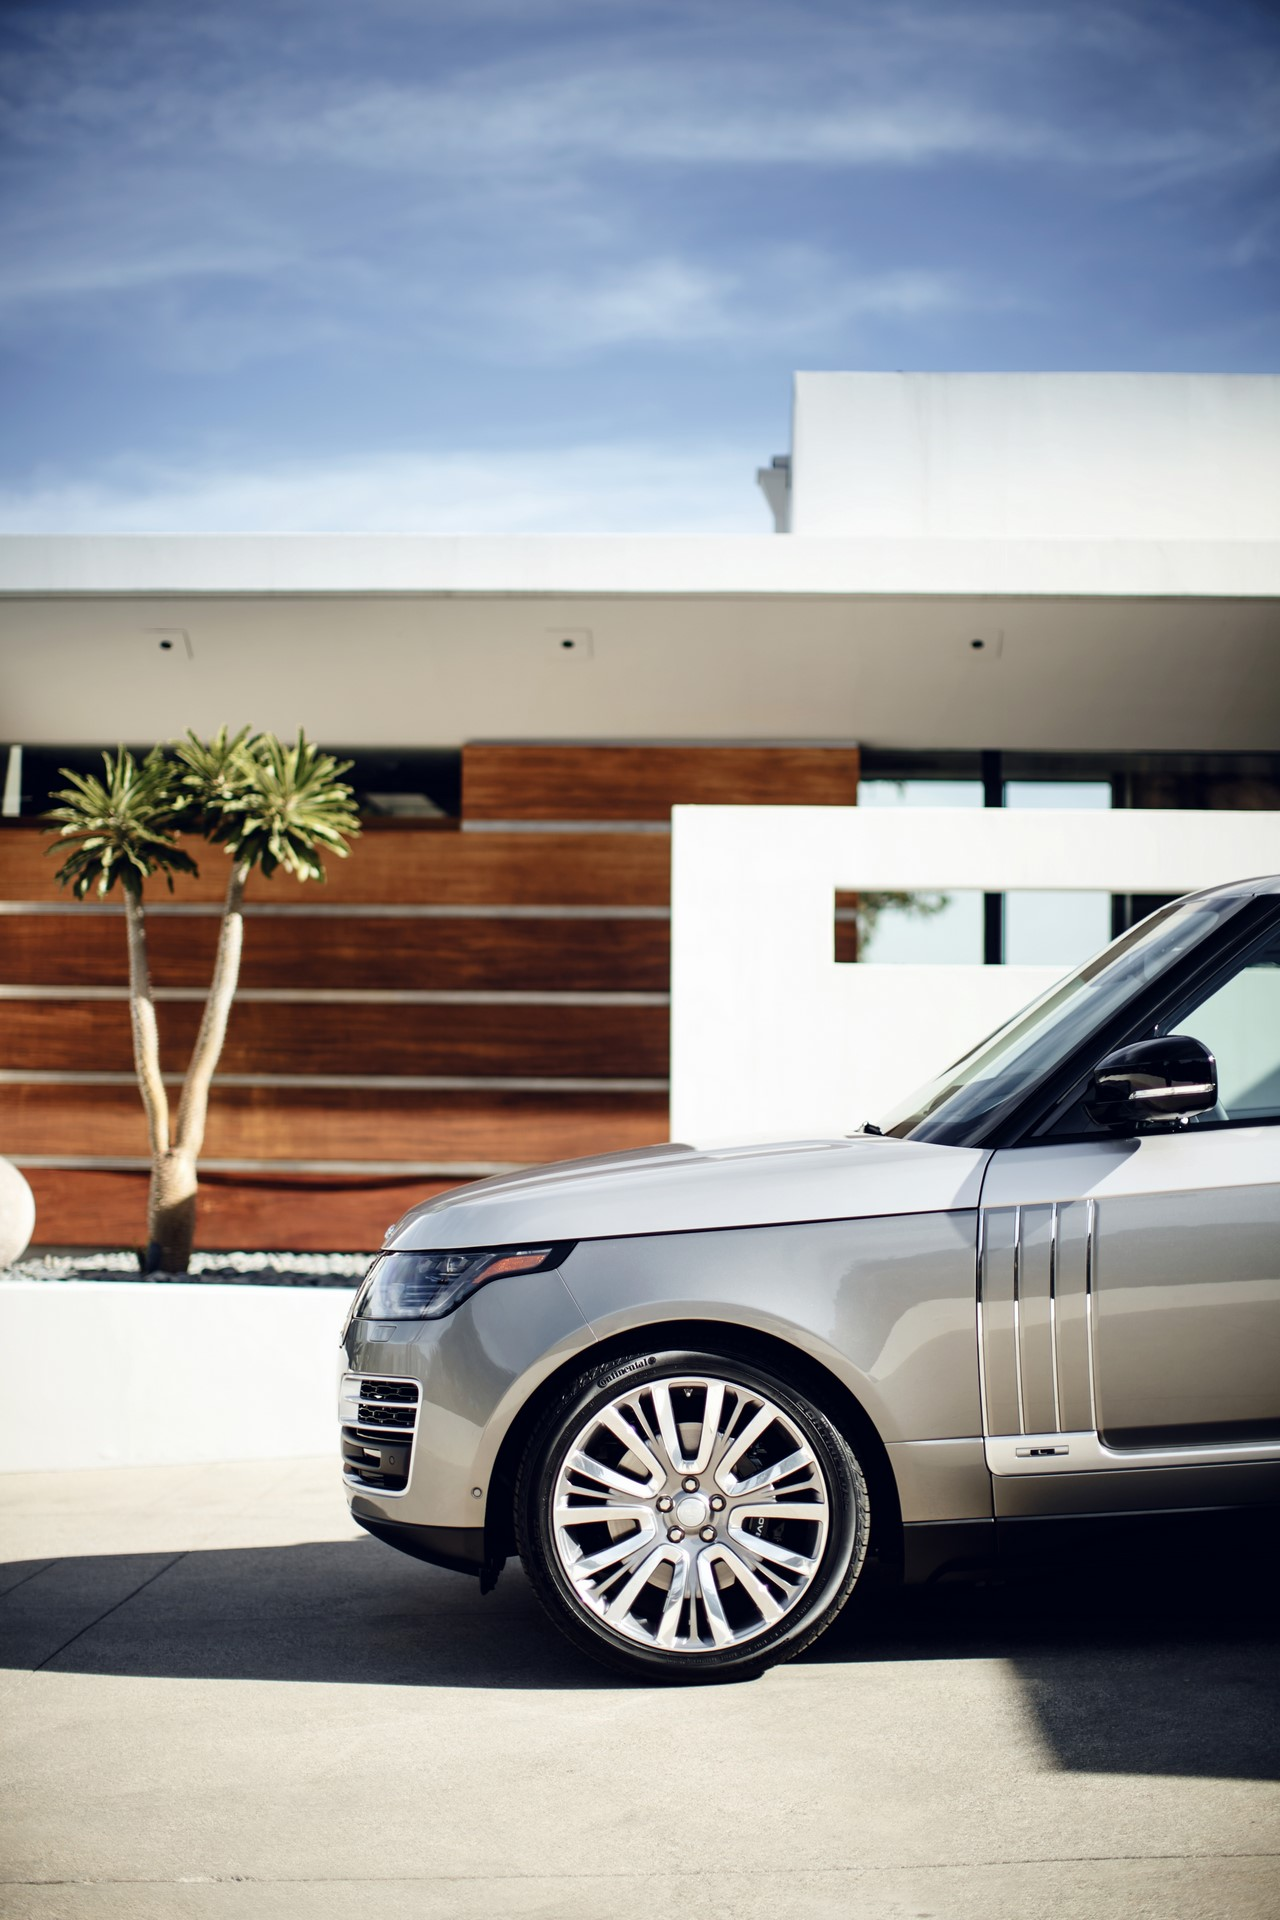 Range Rover SVAutobiography 2018 (19)